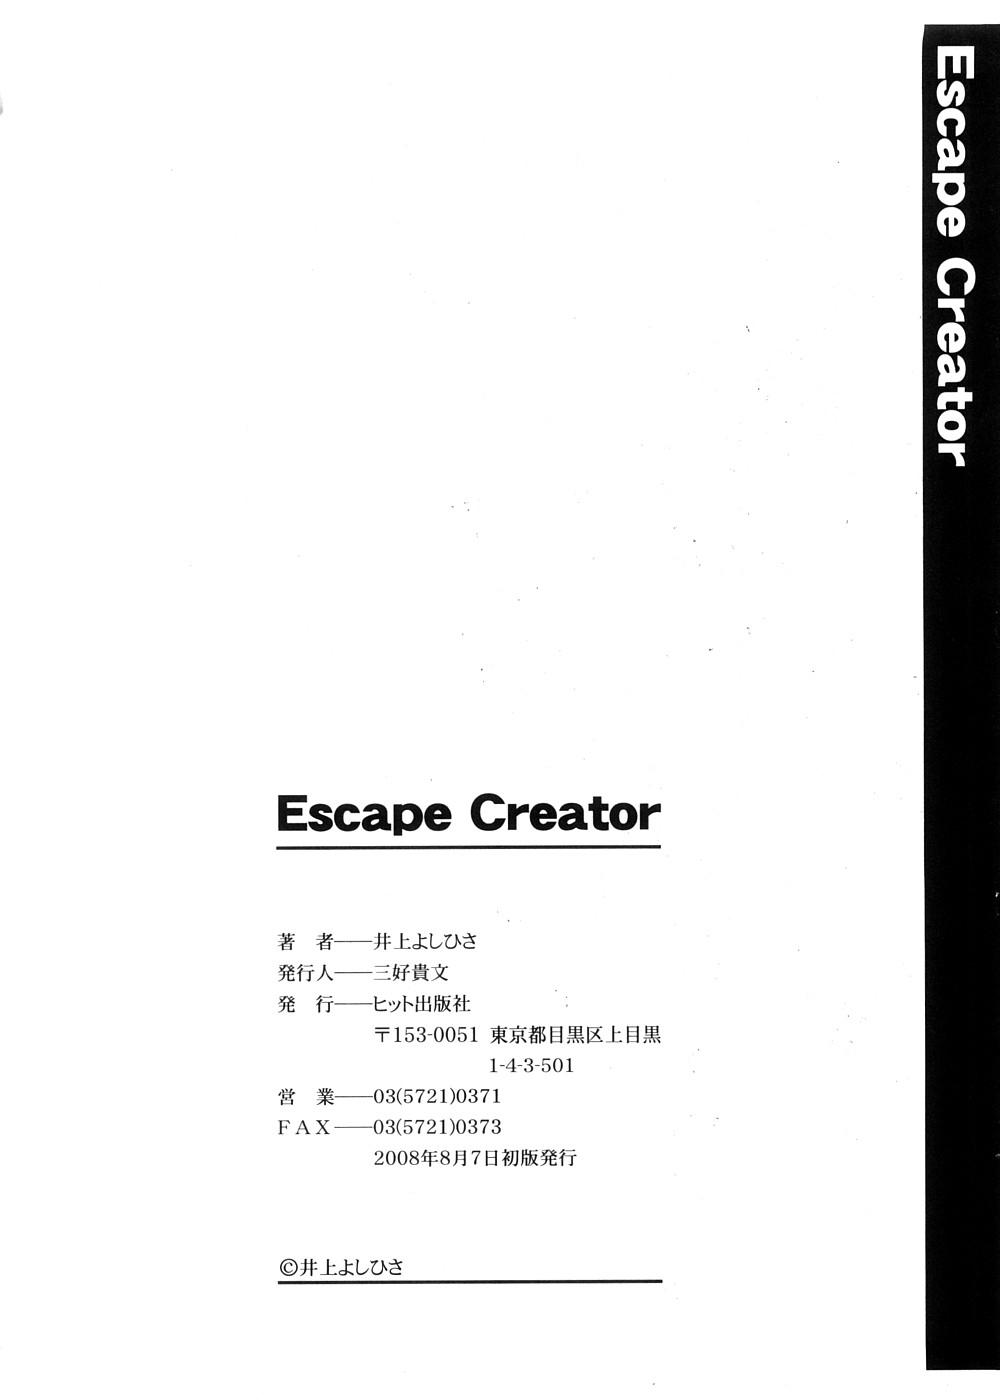 HentaiVN.net - Ảnh 37 - Escape Creator - Chap 8